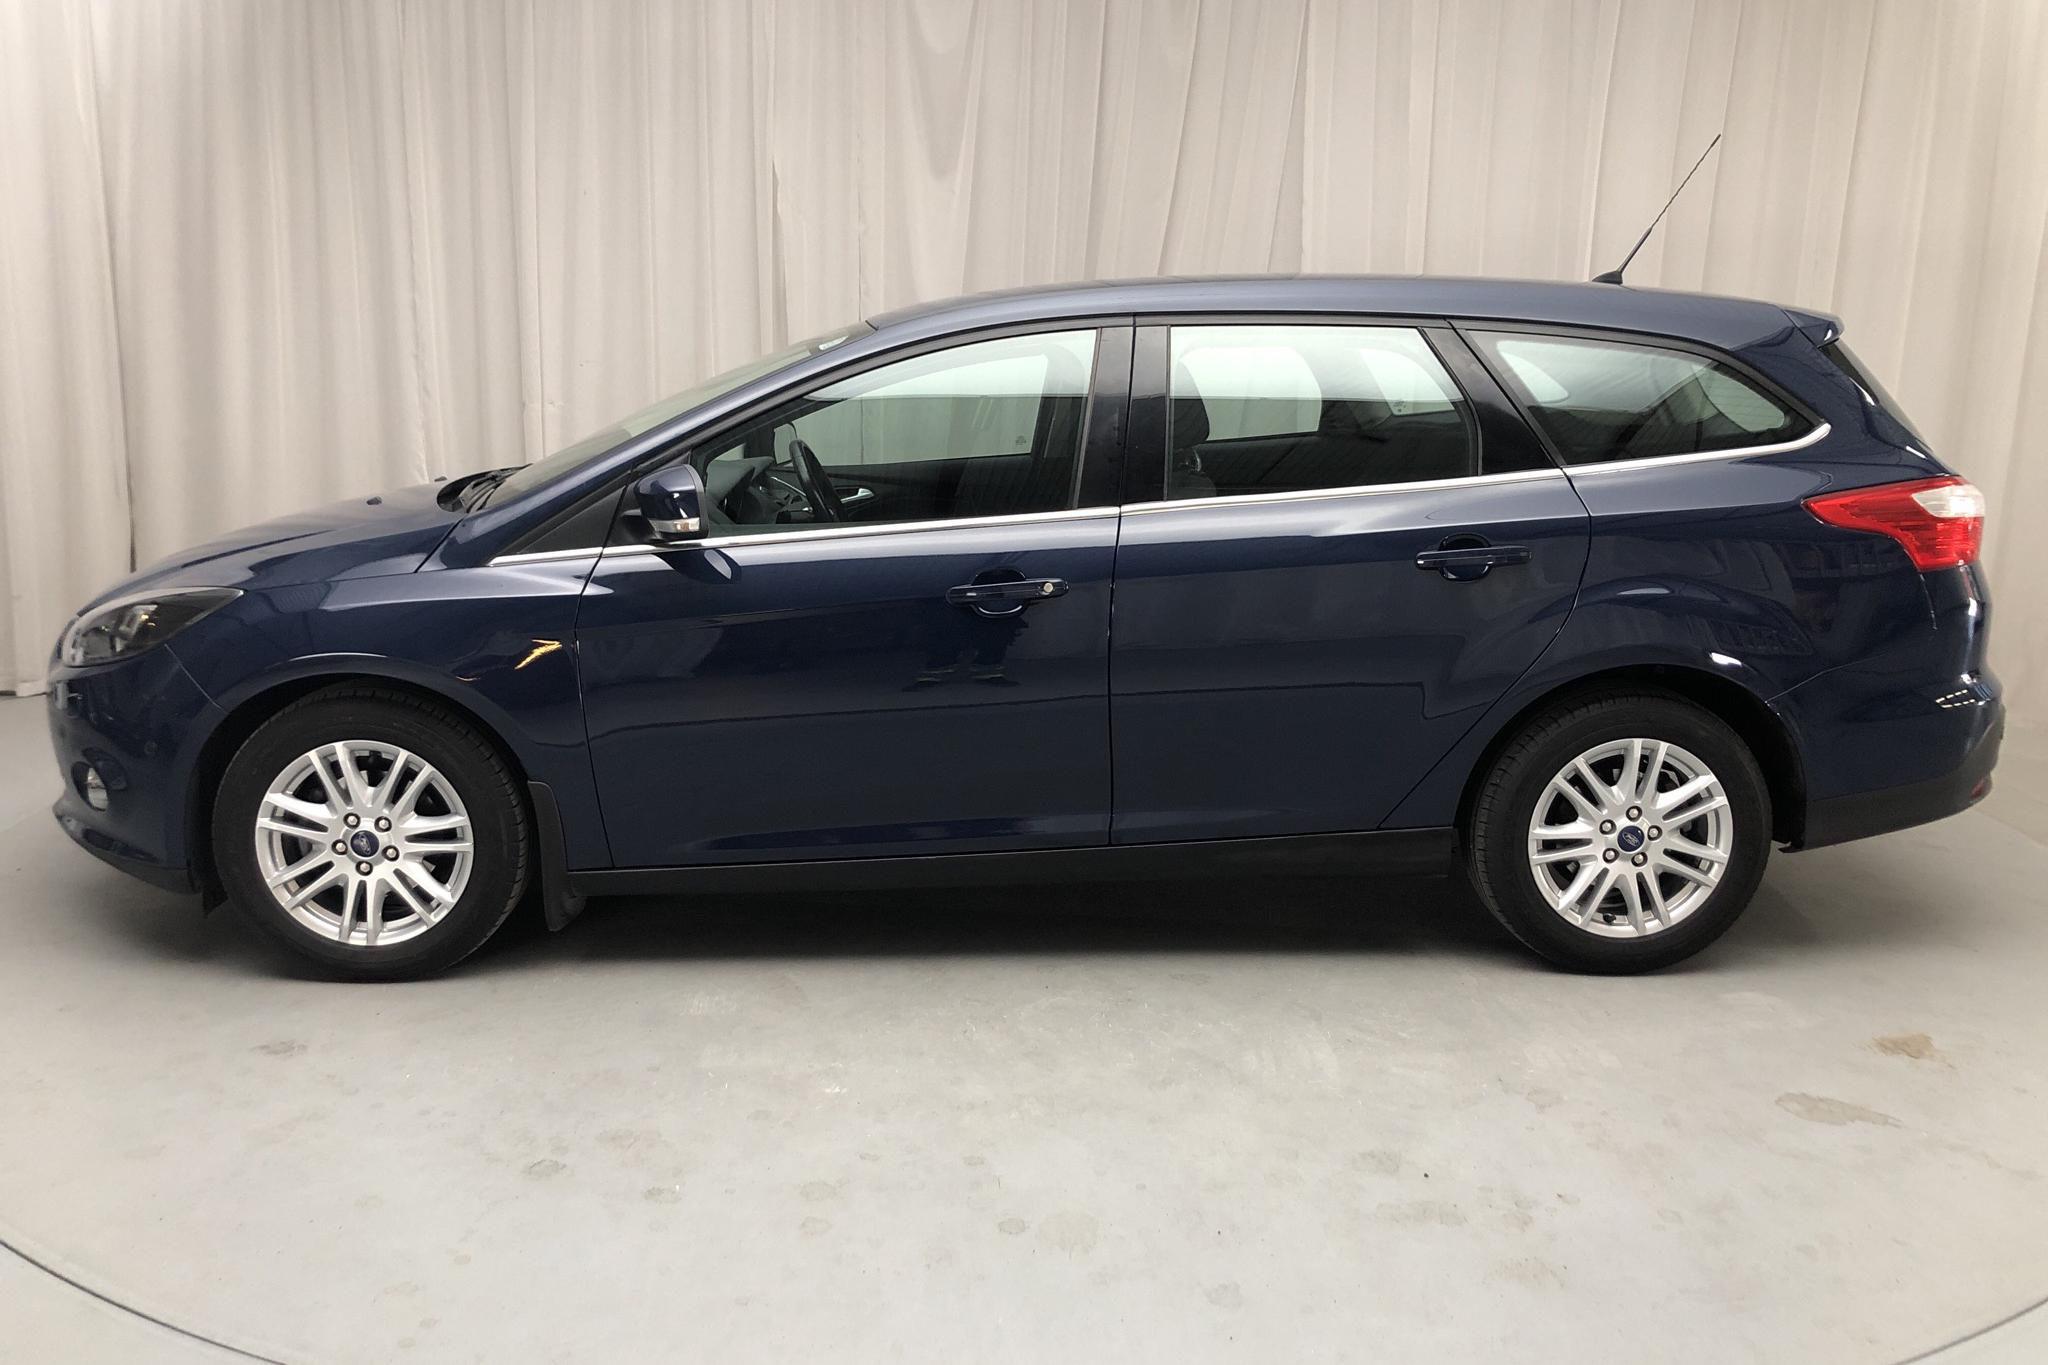 Ford Focus 1.0 EcoBoost Kombi (100hk) - 103 730 km - Manual - blue - 2013